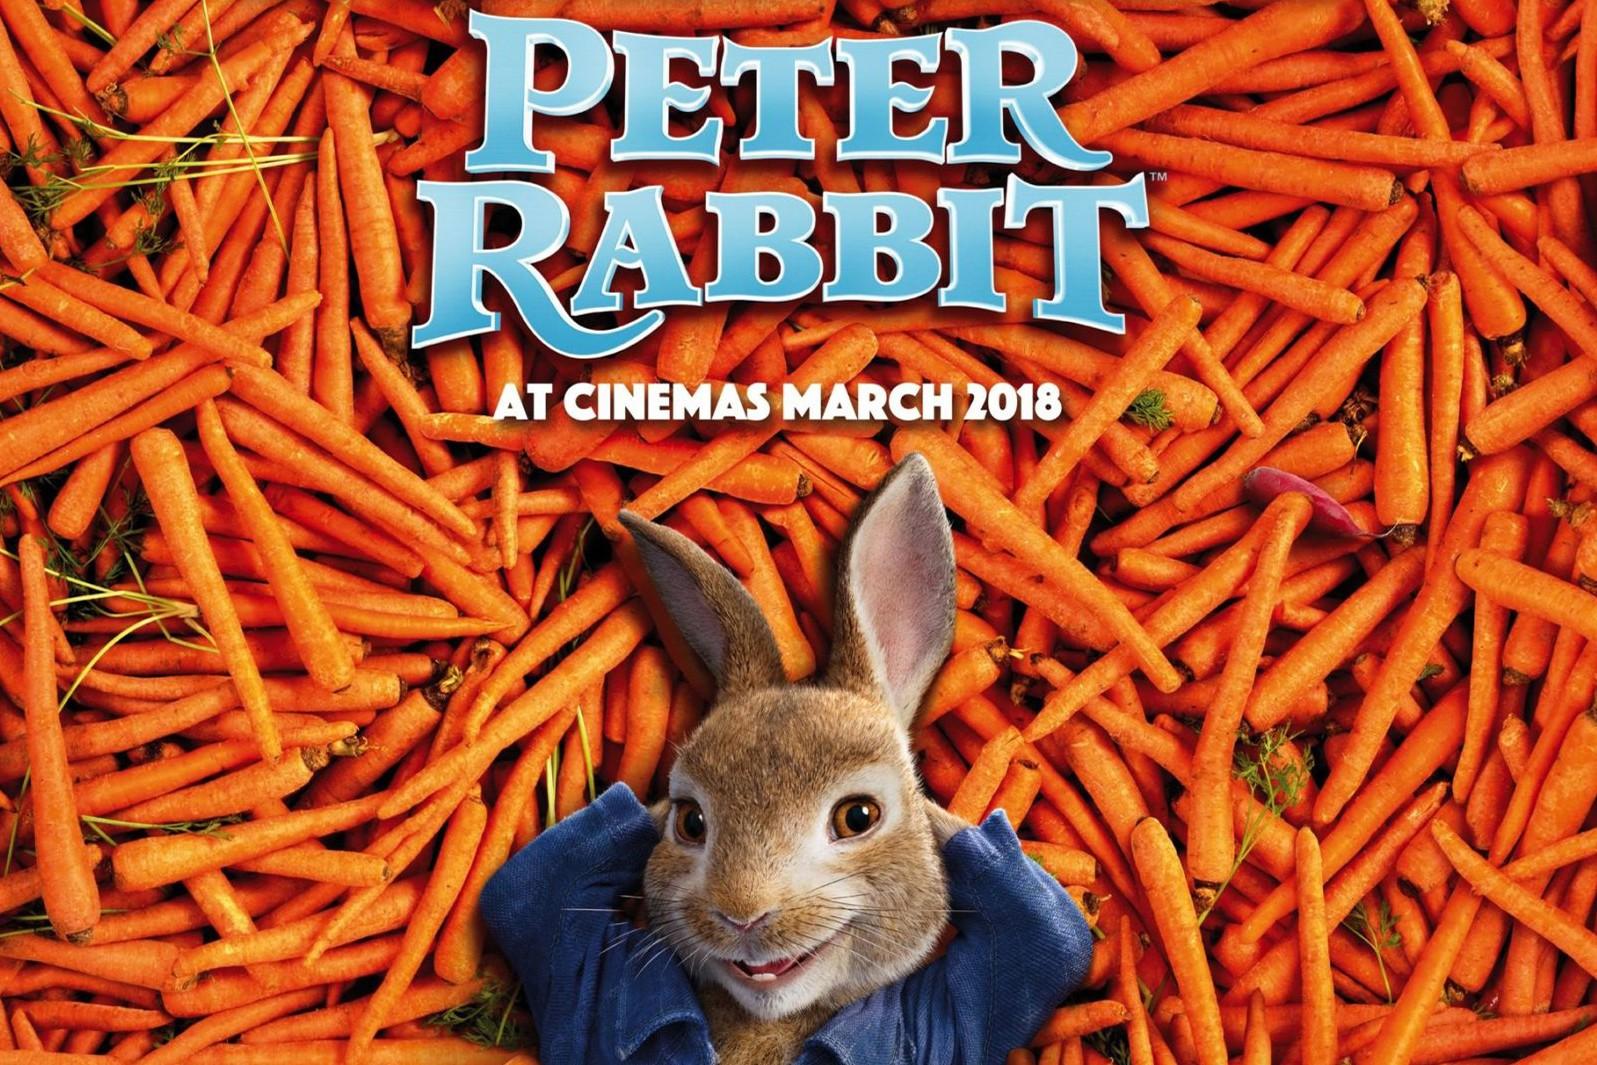 Peter-Rabbit-UK-posterPeter Rabbit buys the kids will love